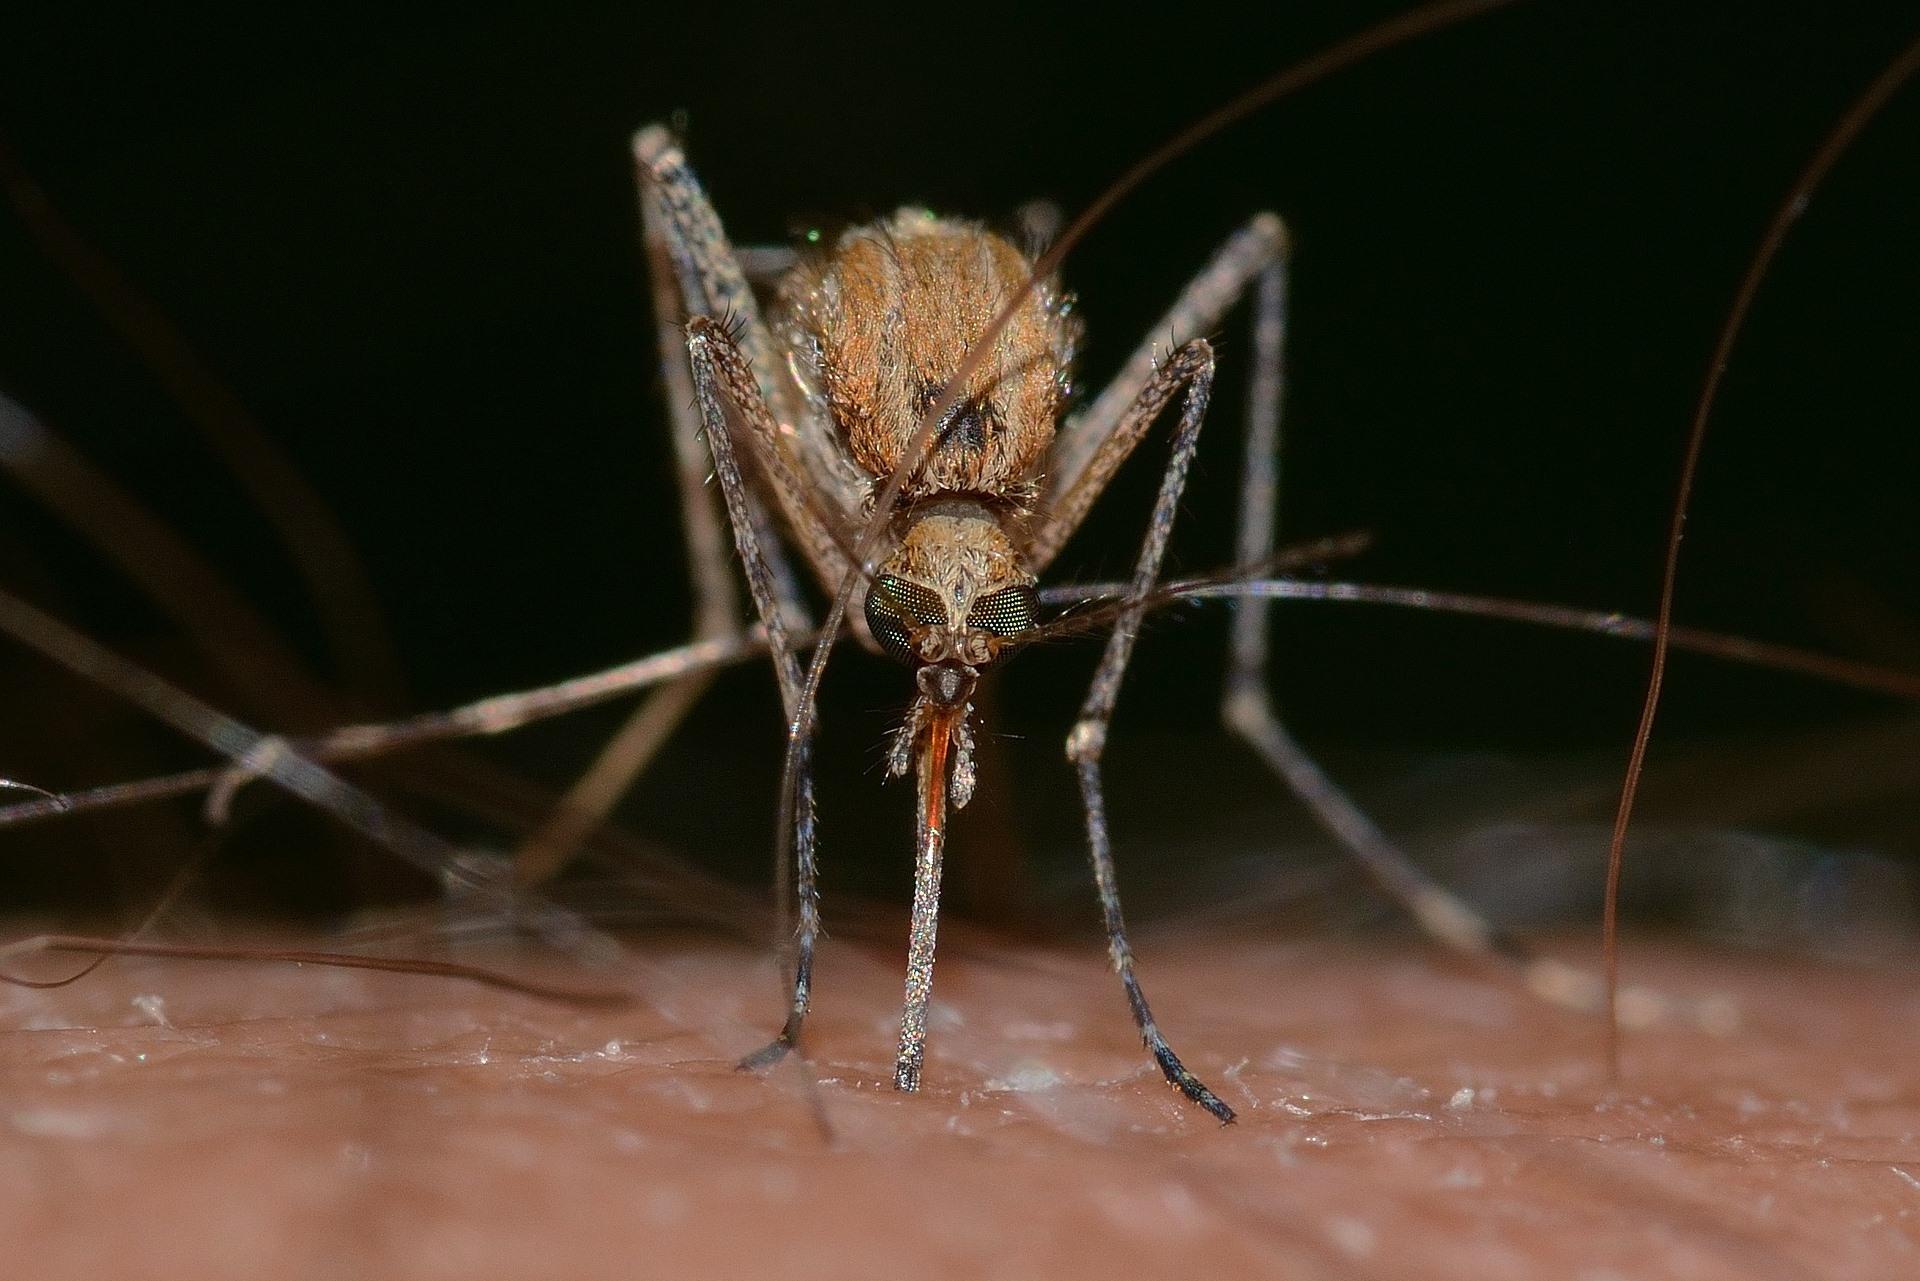 coronavirus a través de mosquitos